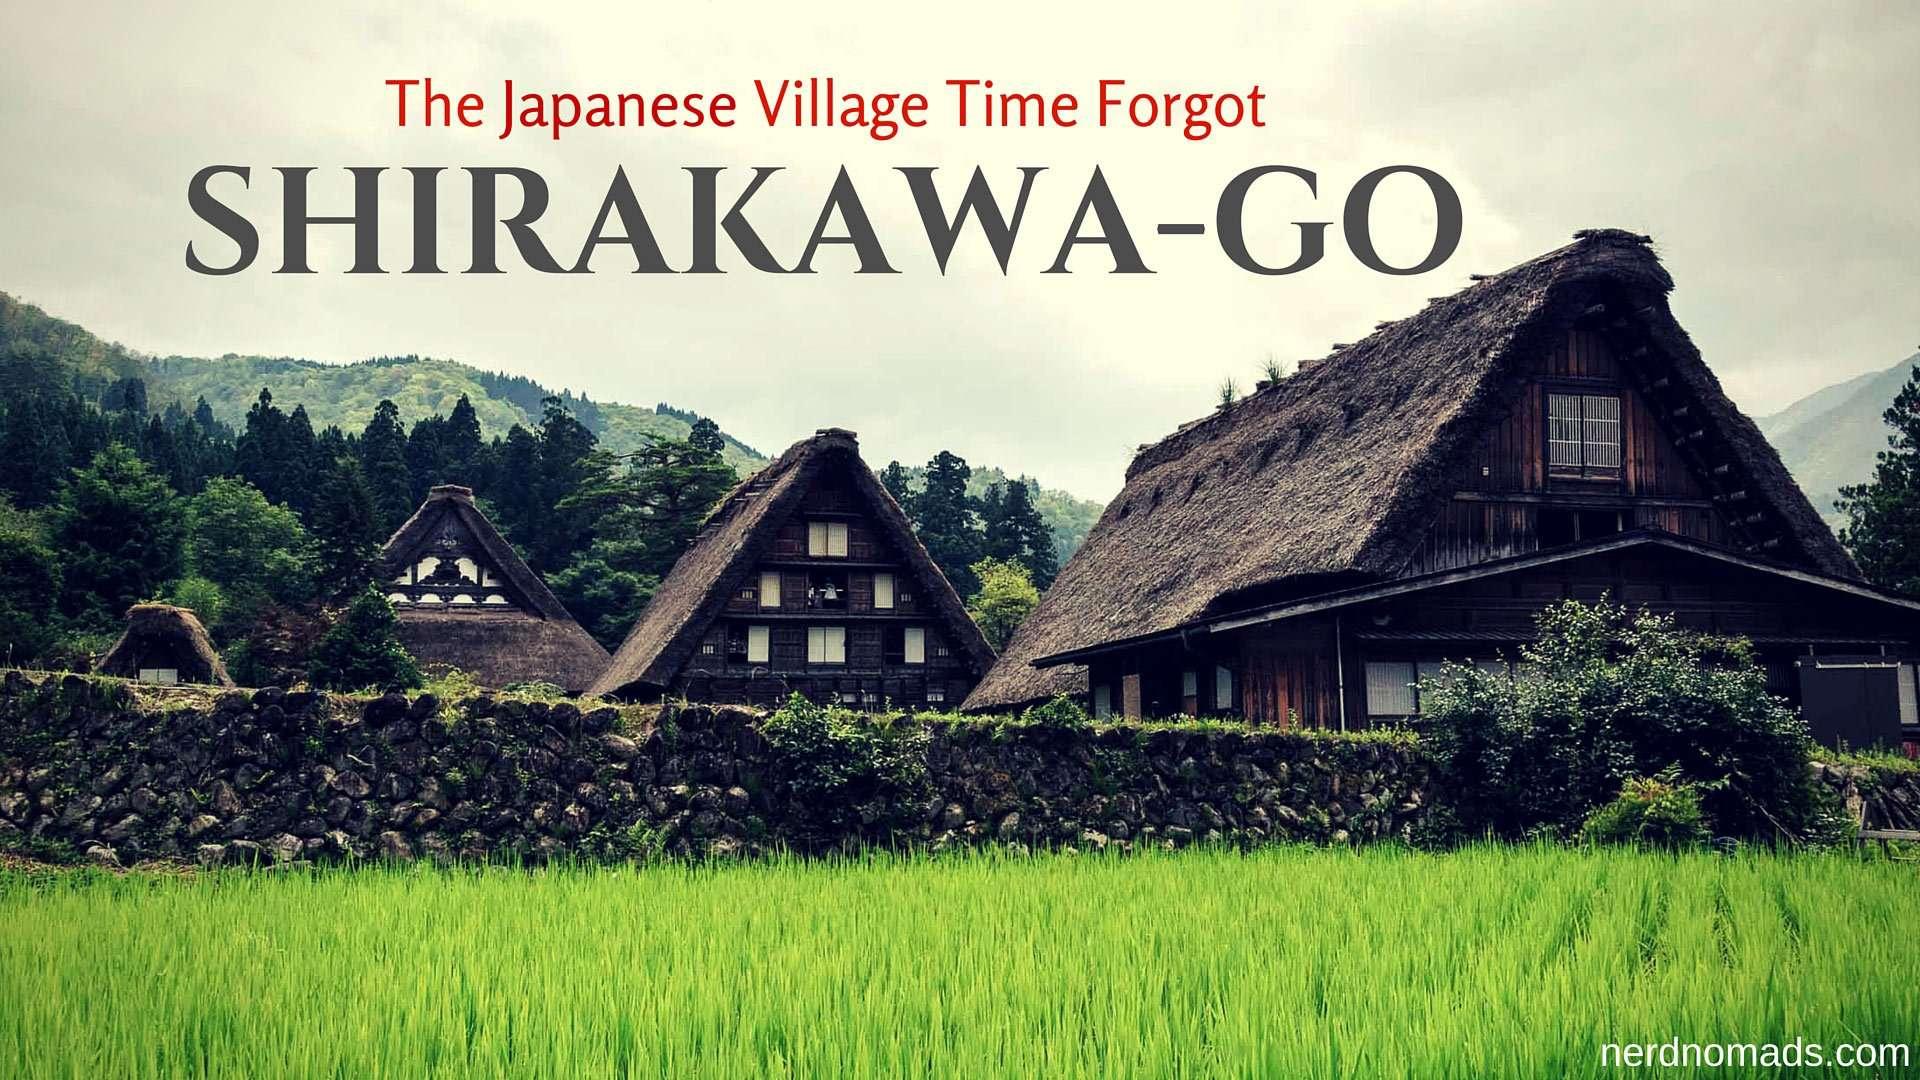 The Japanese Village Time Forgot – Shirakawa-go